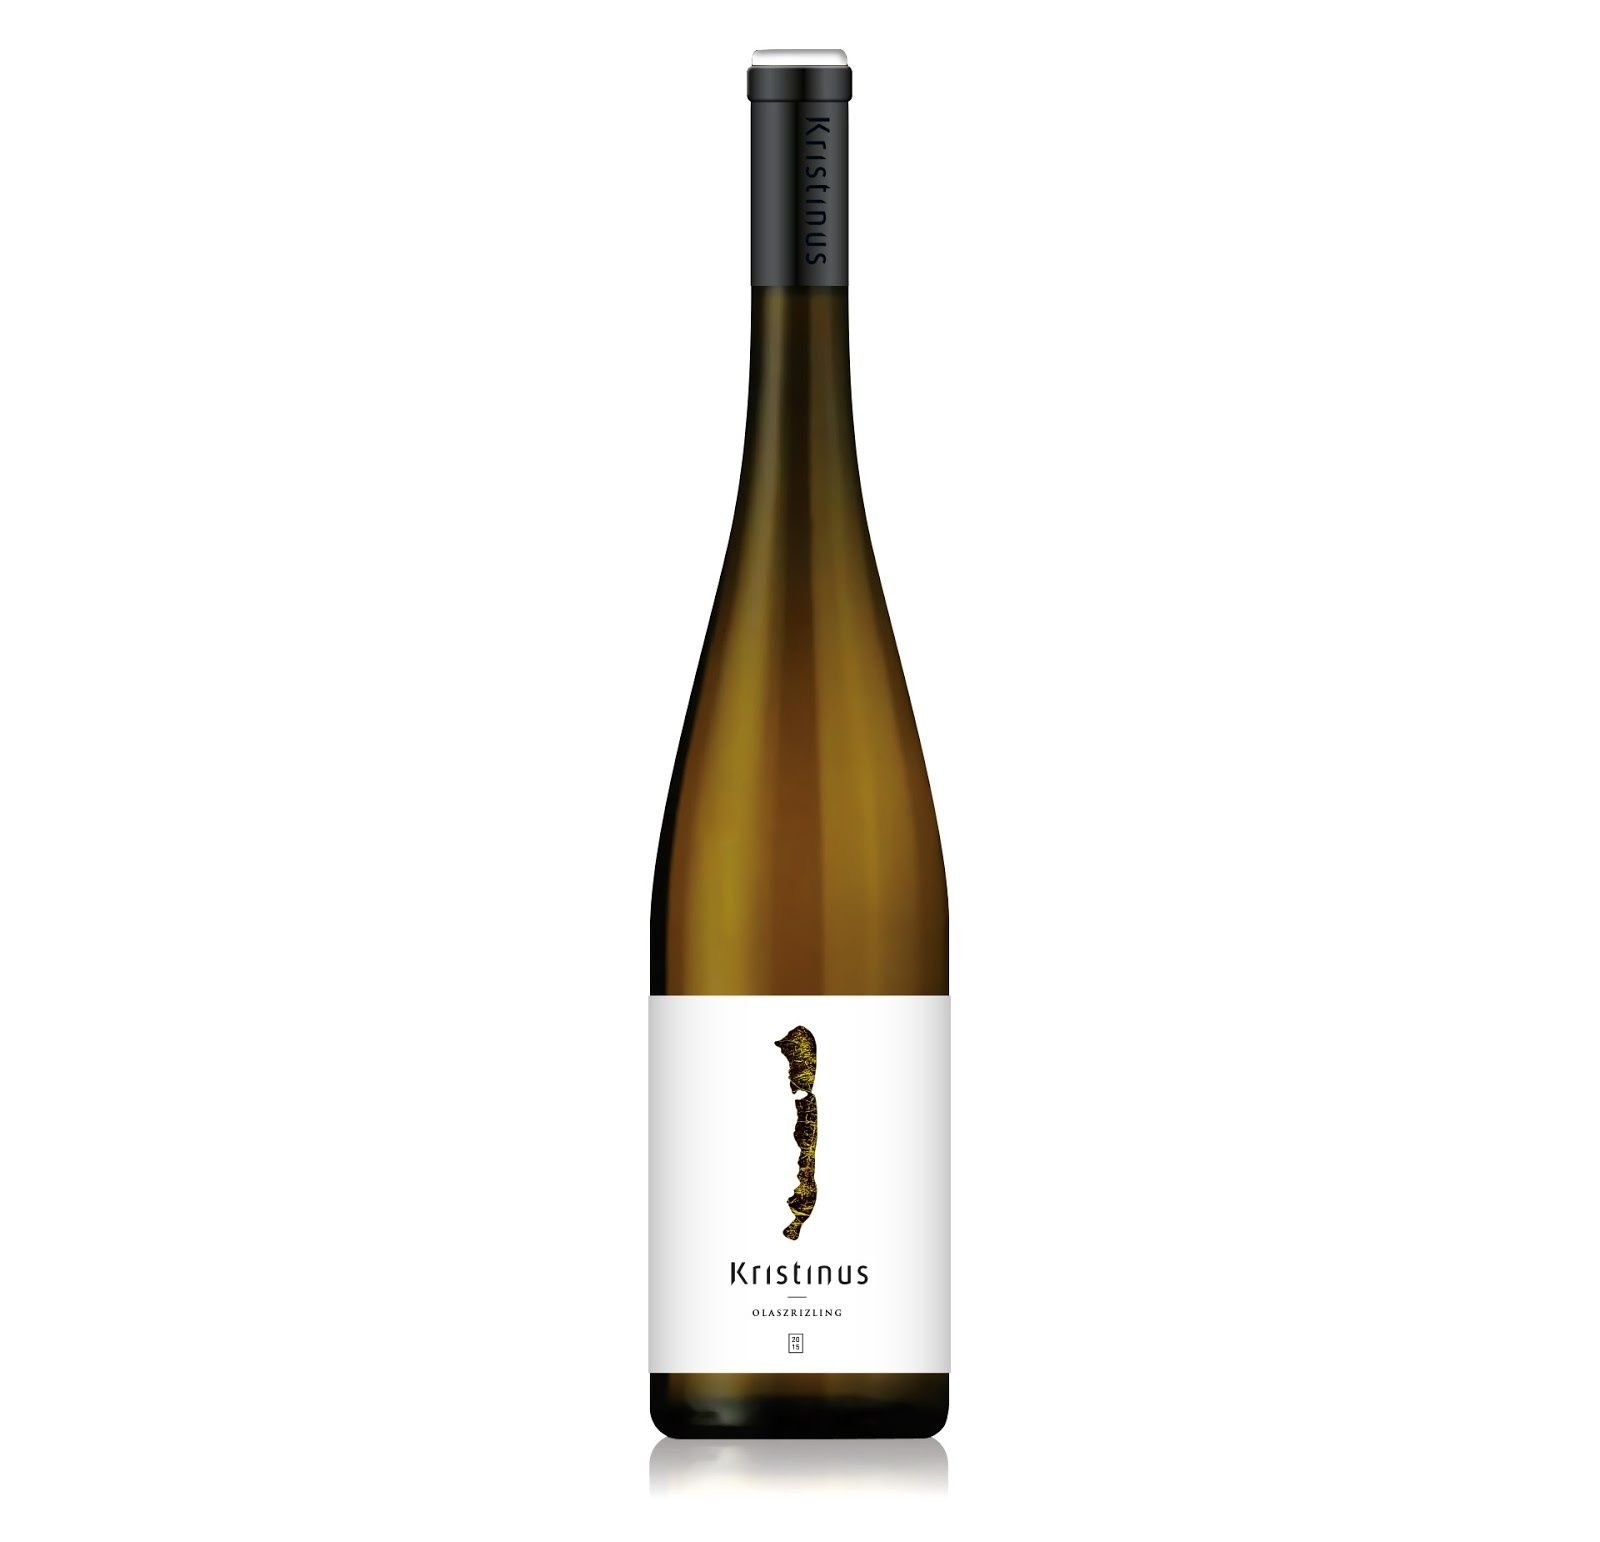 Kristinus Wine Estate (vin hongrois) I Design : Kiss Zsombor, Kéthely, Hongrie (octobre 2016)